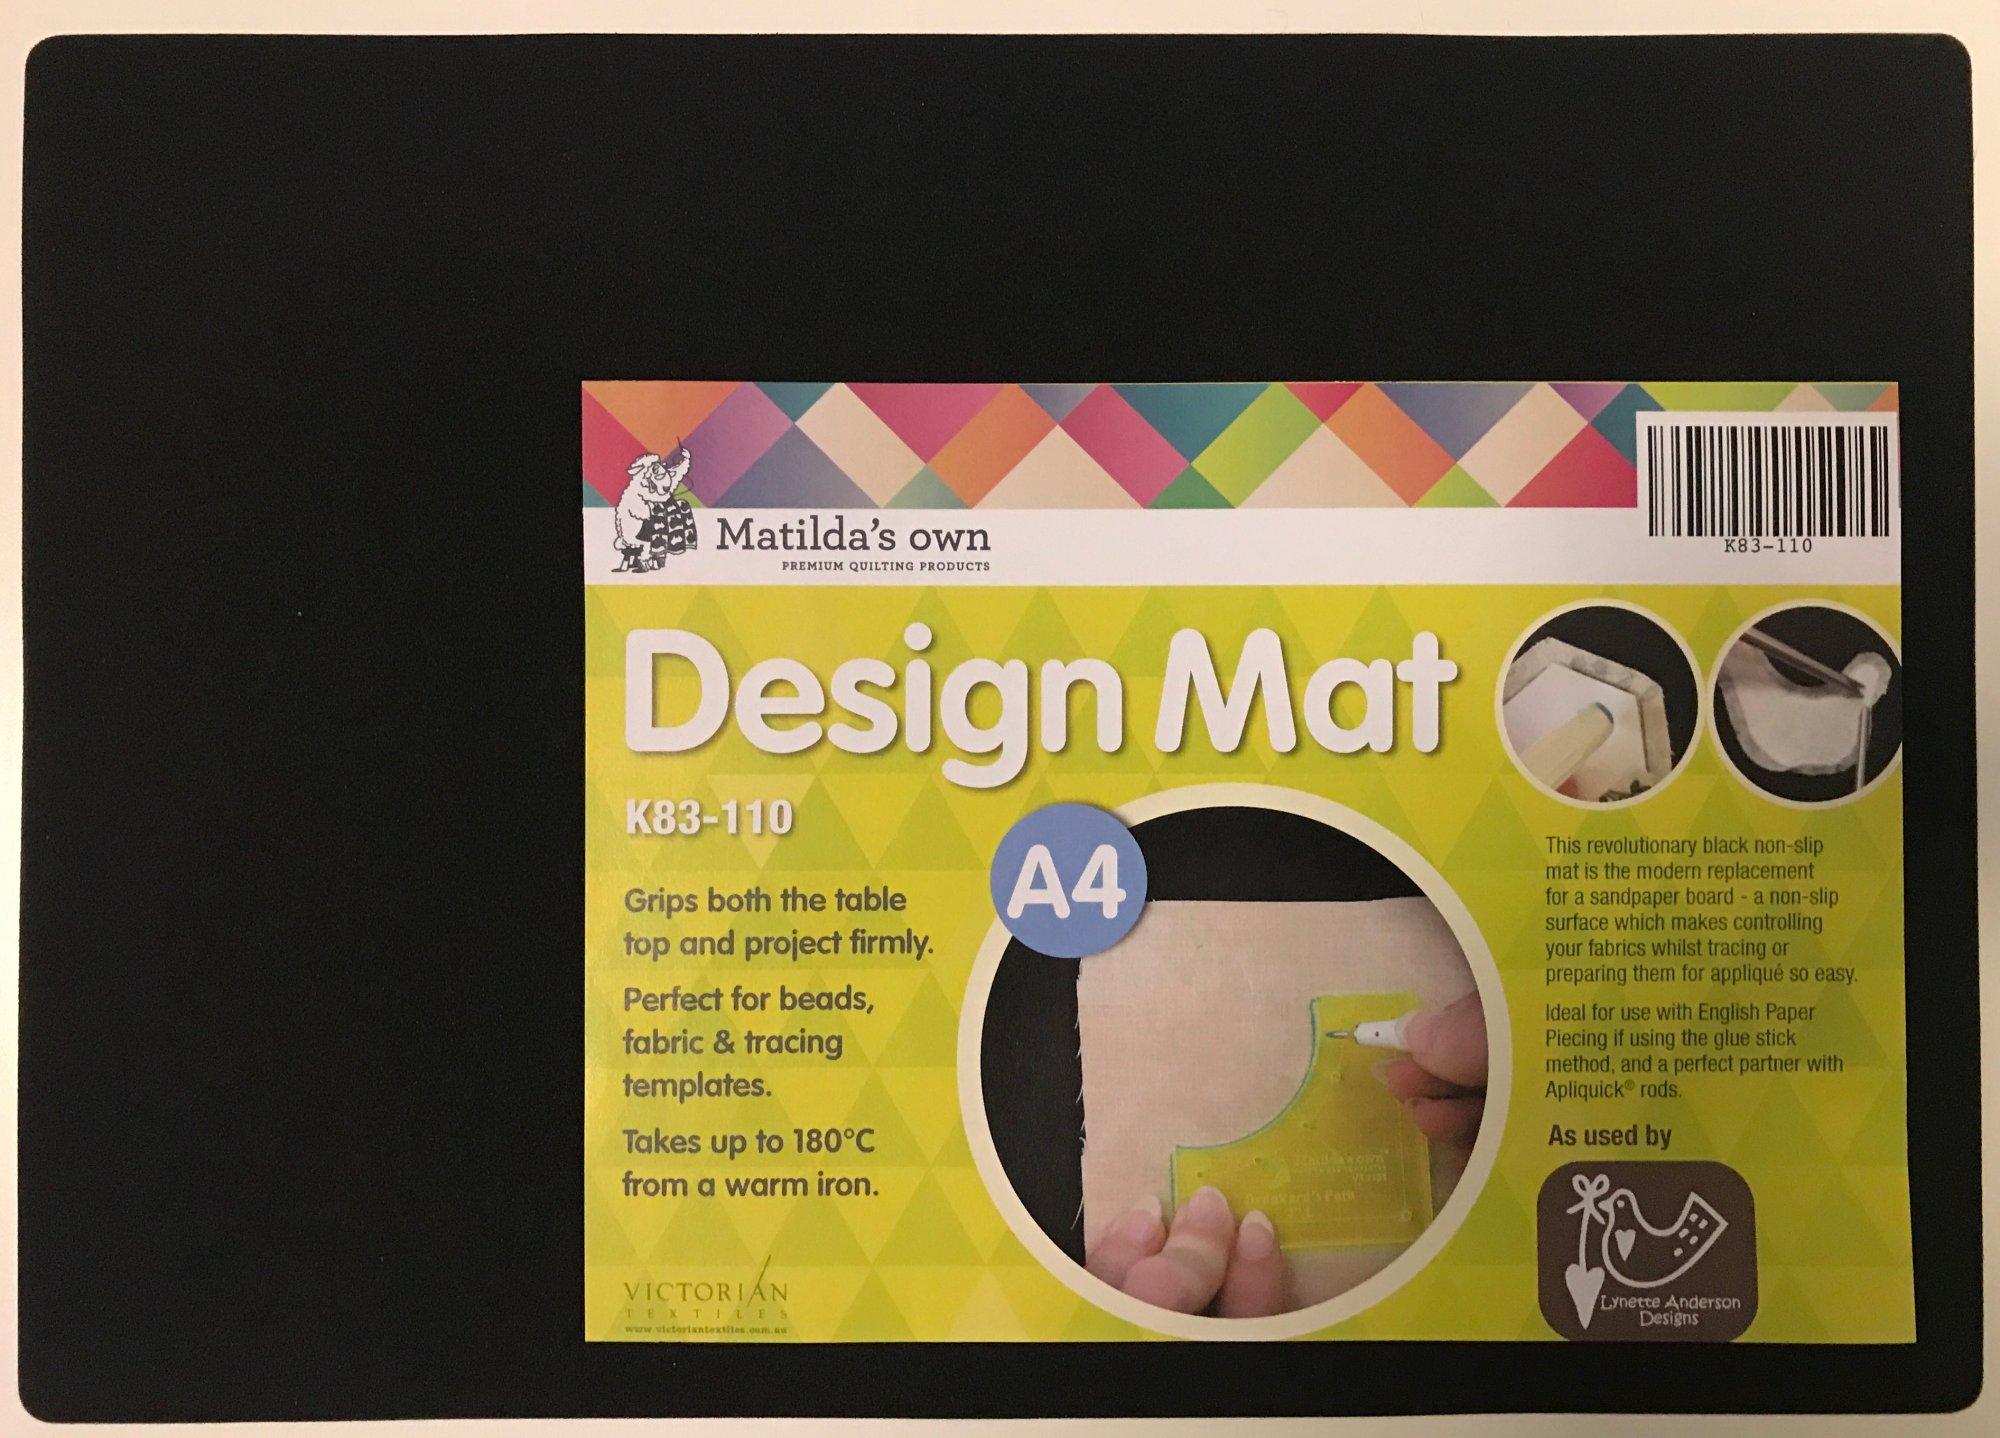 Design Mat - black non slip